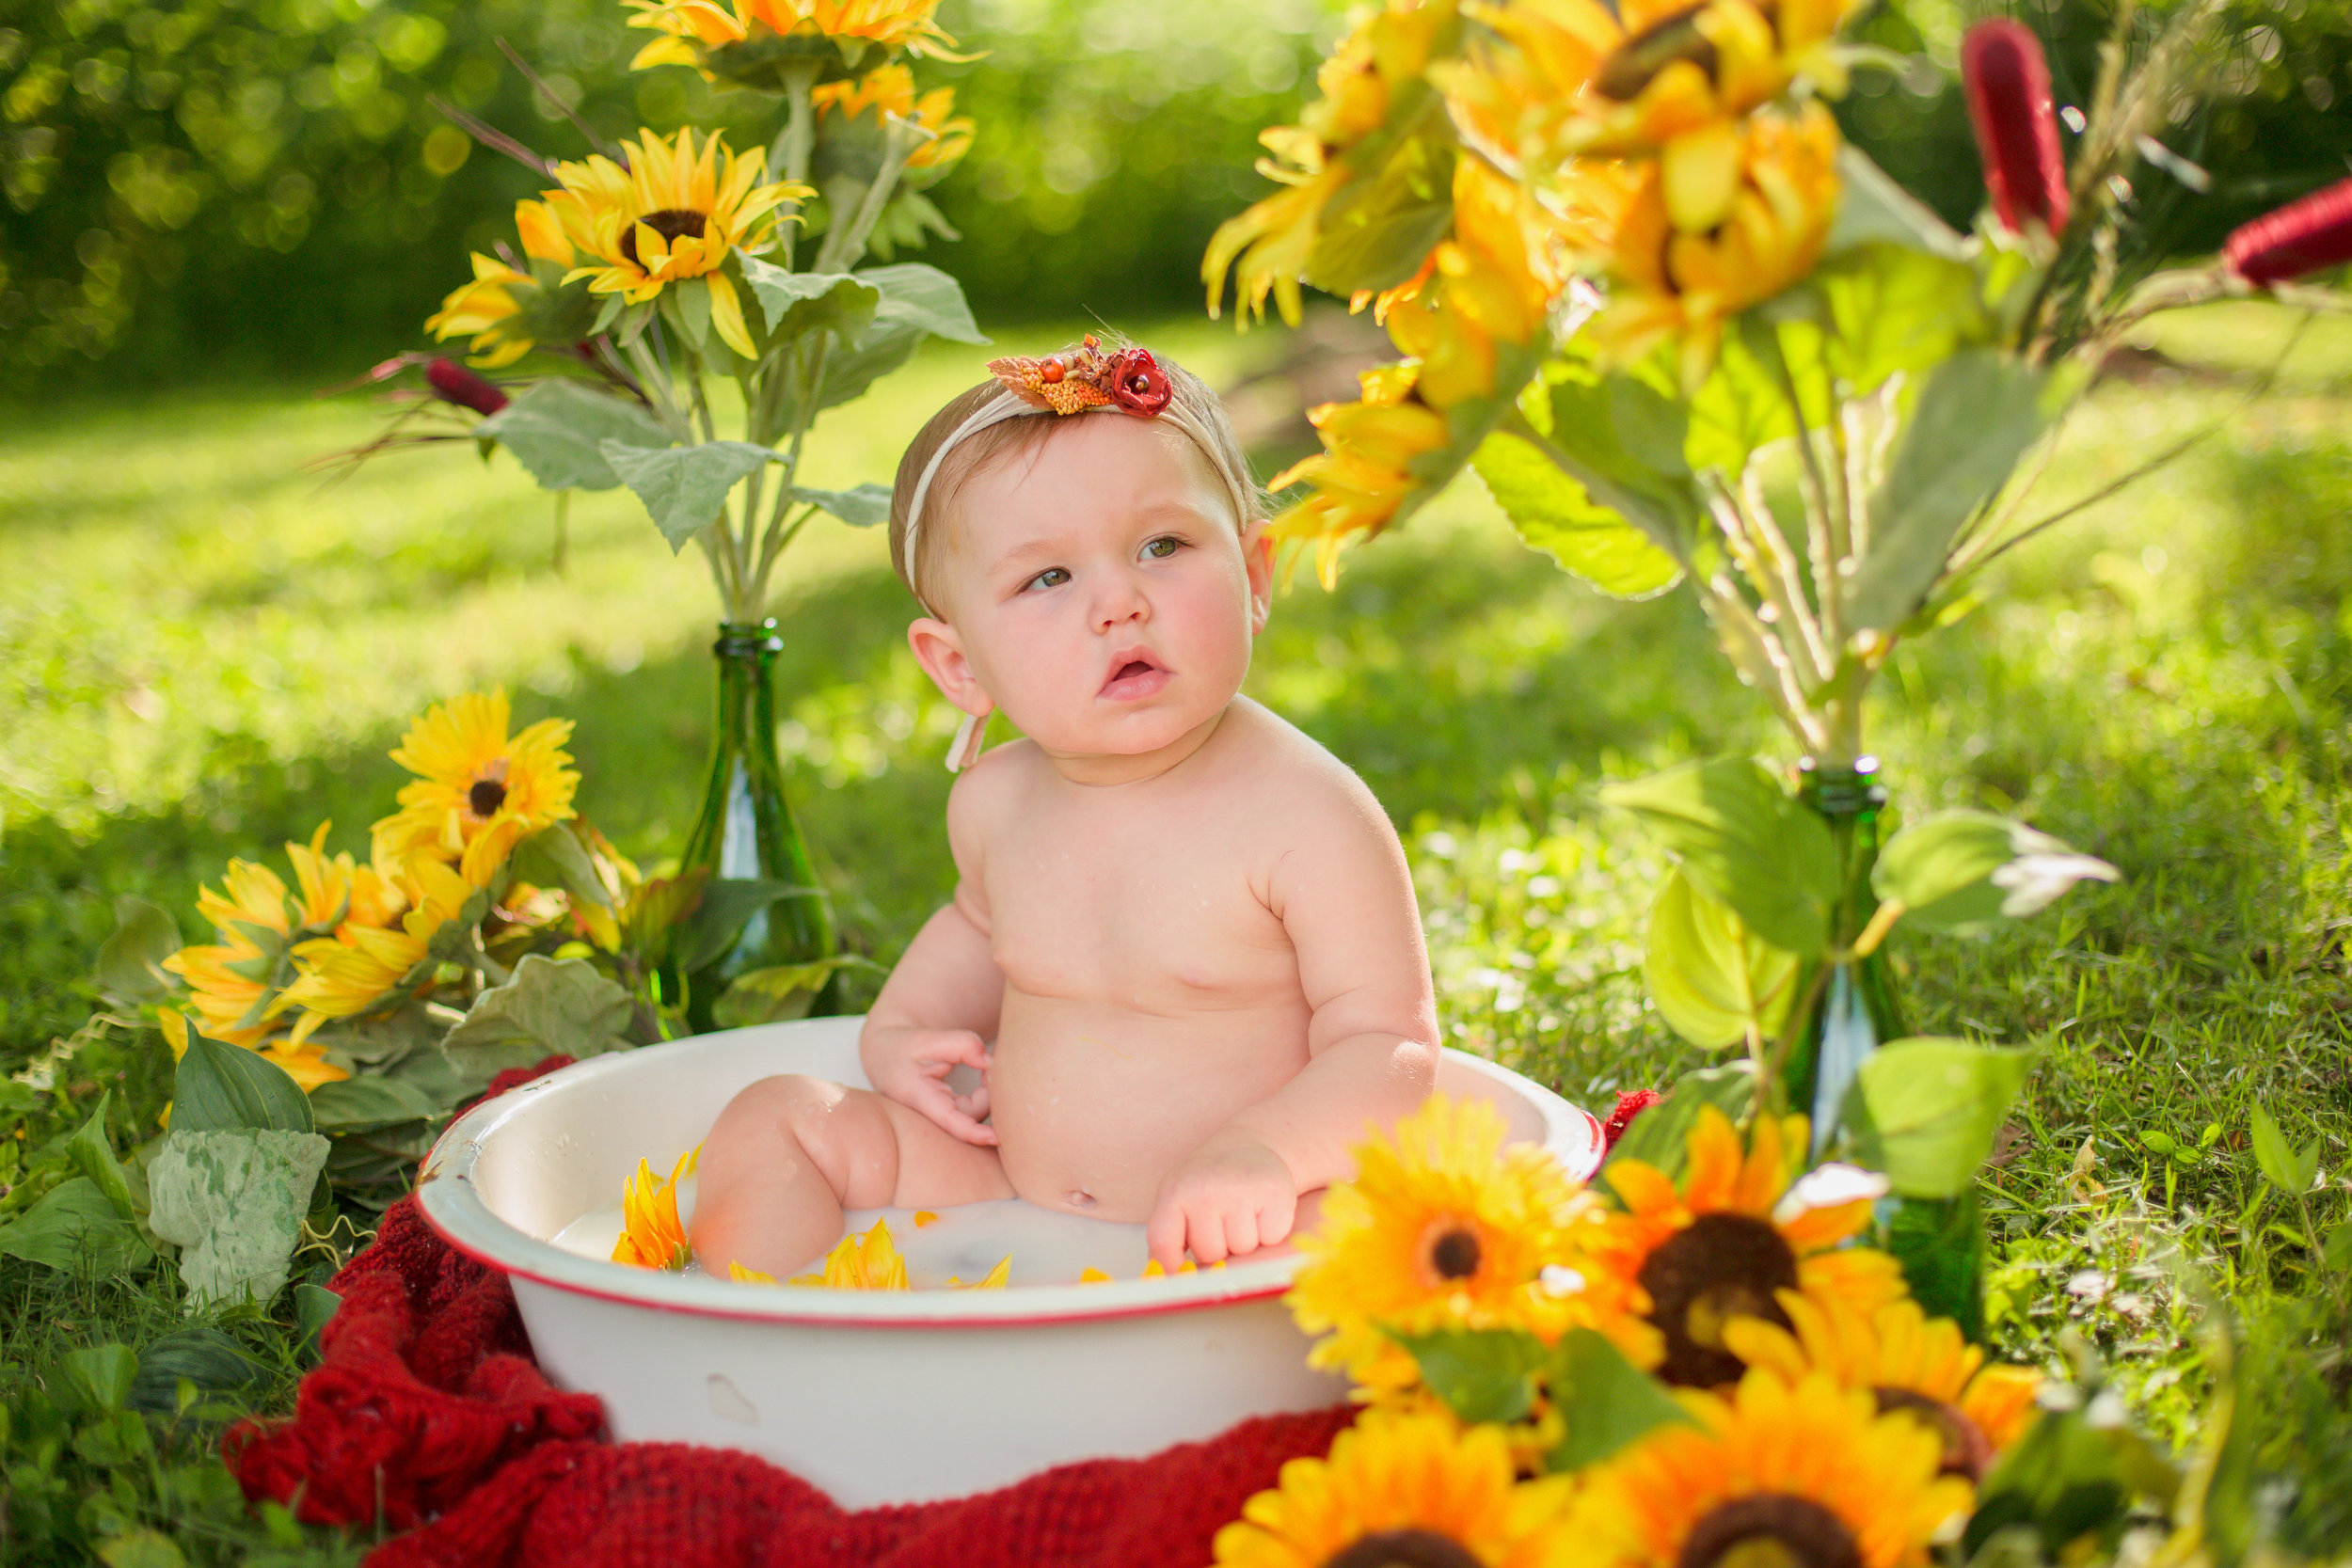 Sawyer-Jo-Sunflower-Milk-bath-Nashville-Family-Photographer-Chelsea-Meadows-Photography-(2).jpg